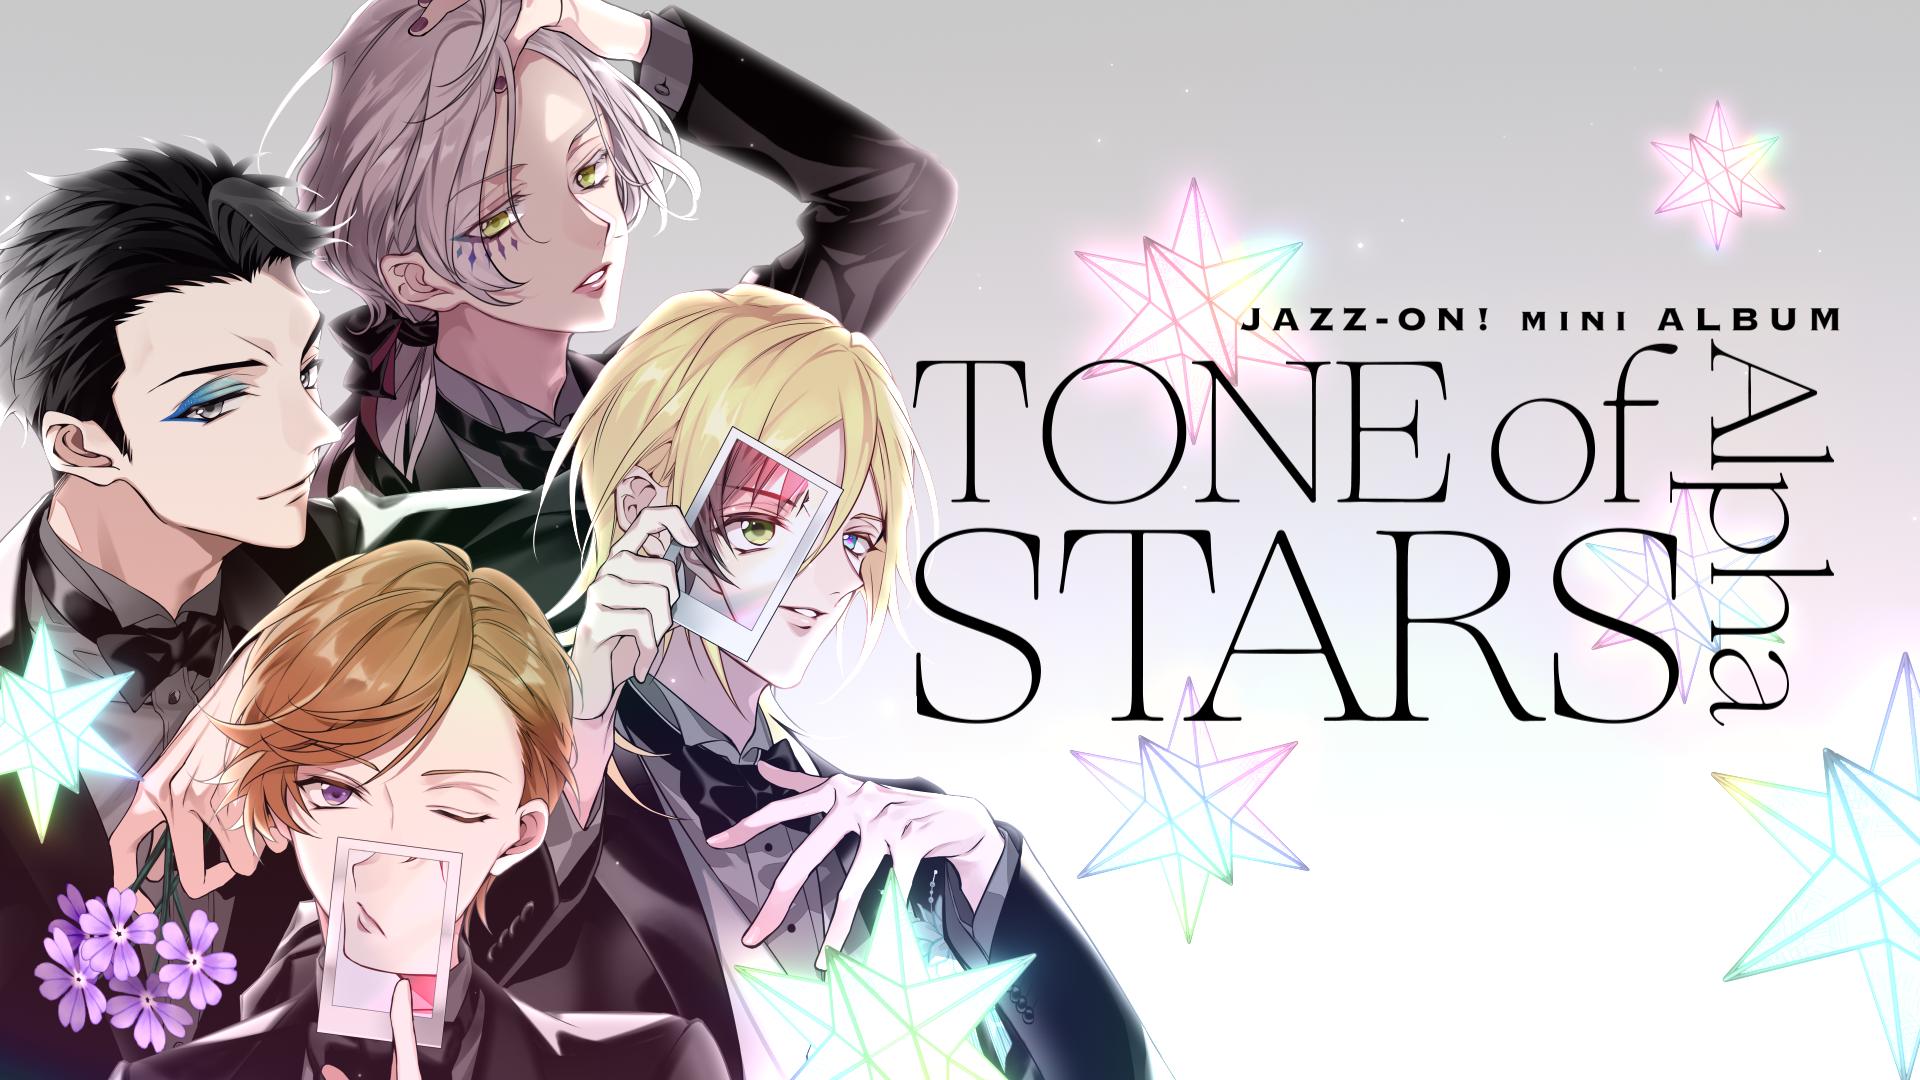 「JAZZ-ON!」ミニアルバム発売に先駆け表題曲「Tone of Stars Alpha」MV公開!先行配信も決定